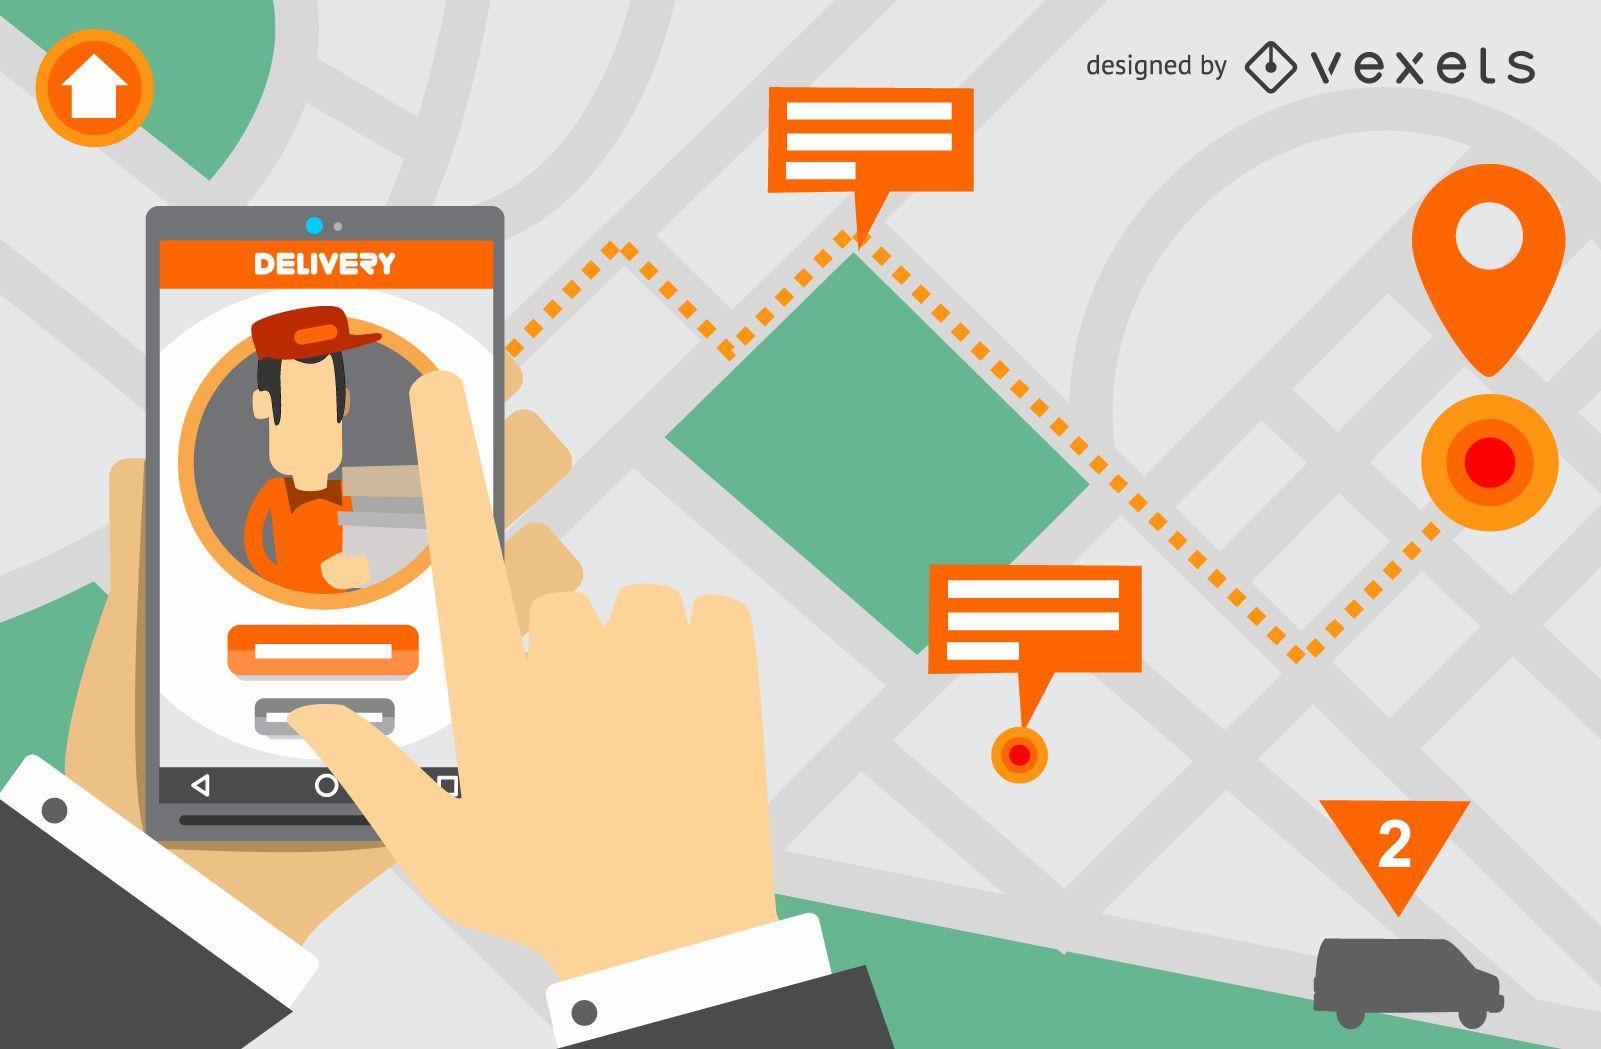 Delivery app screen design